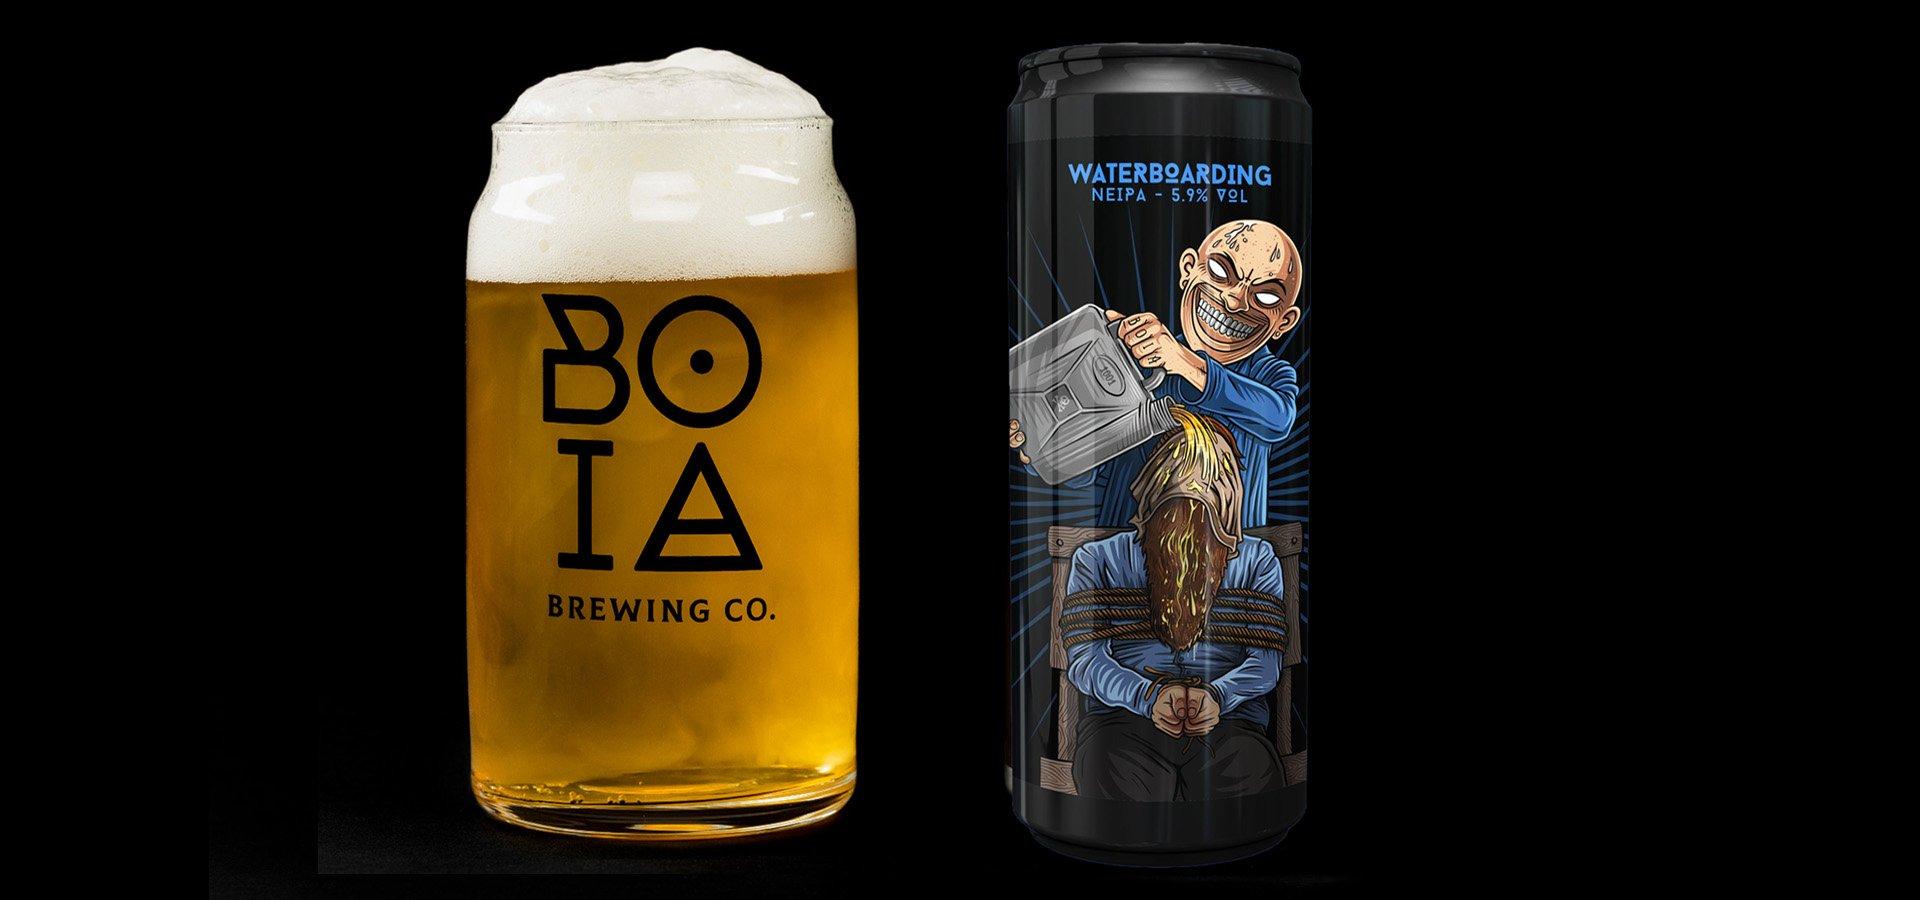 boia brewing co waterboarding